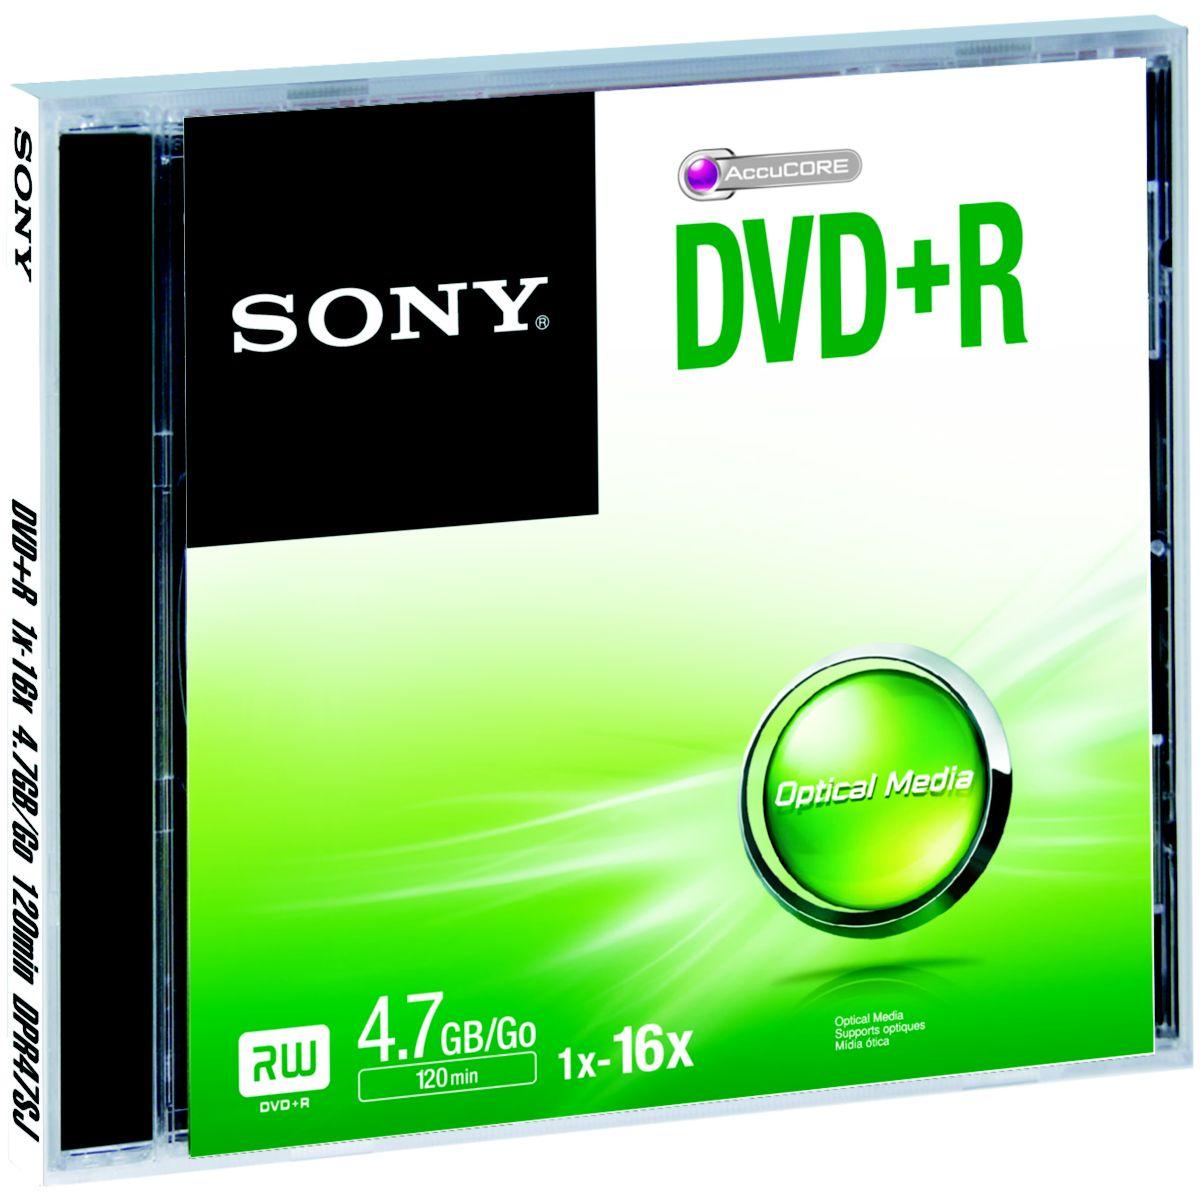 DVD SONY DVD+R 4.7GB X5